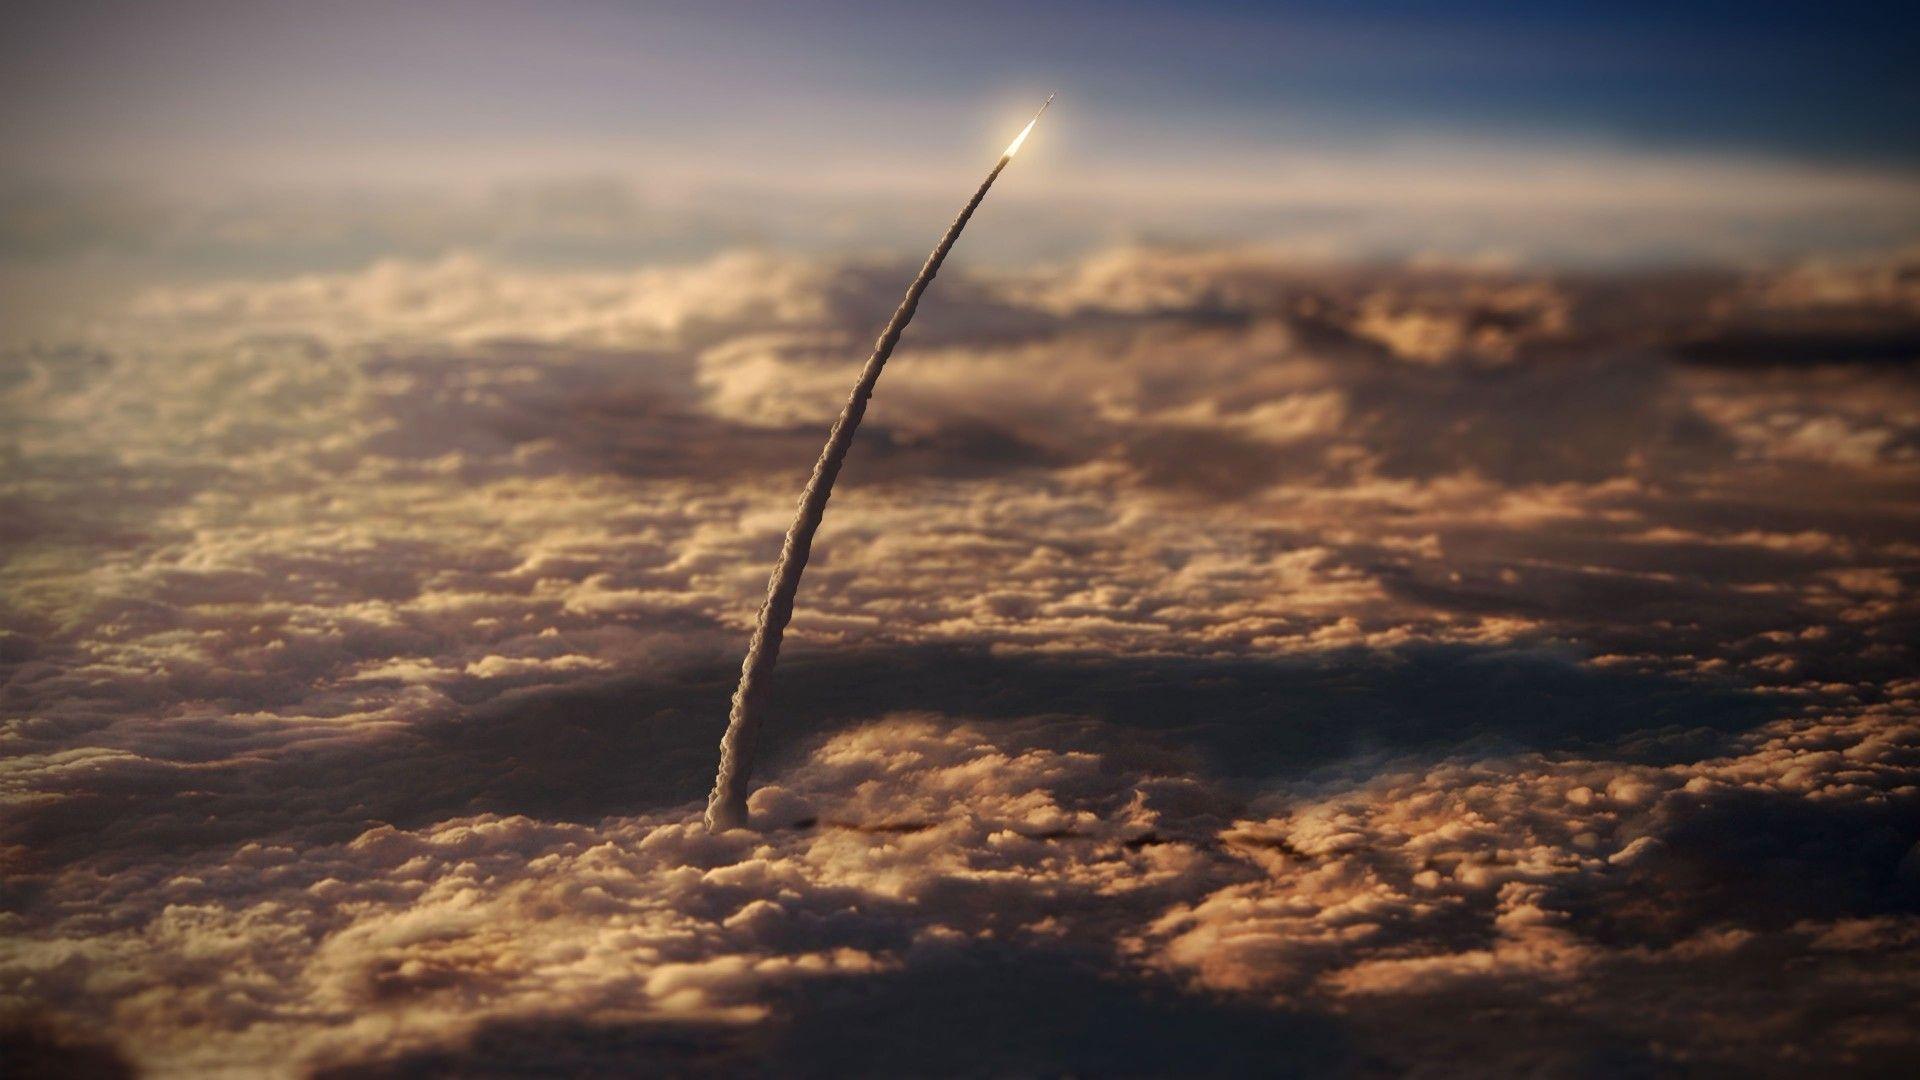 Rocket Free Download Wallpaper